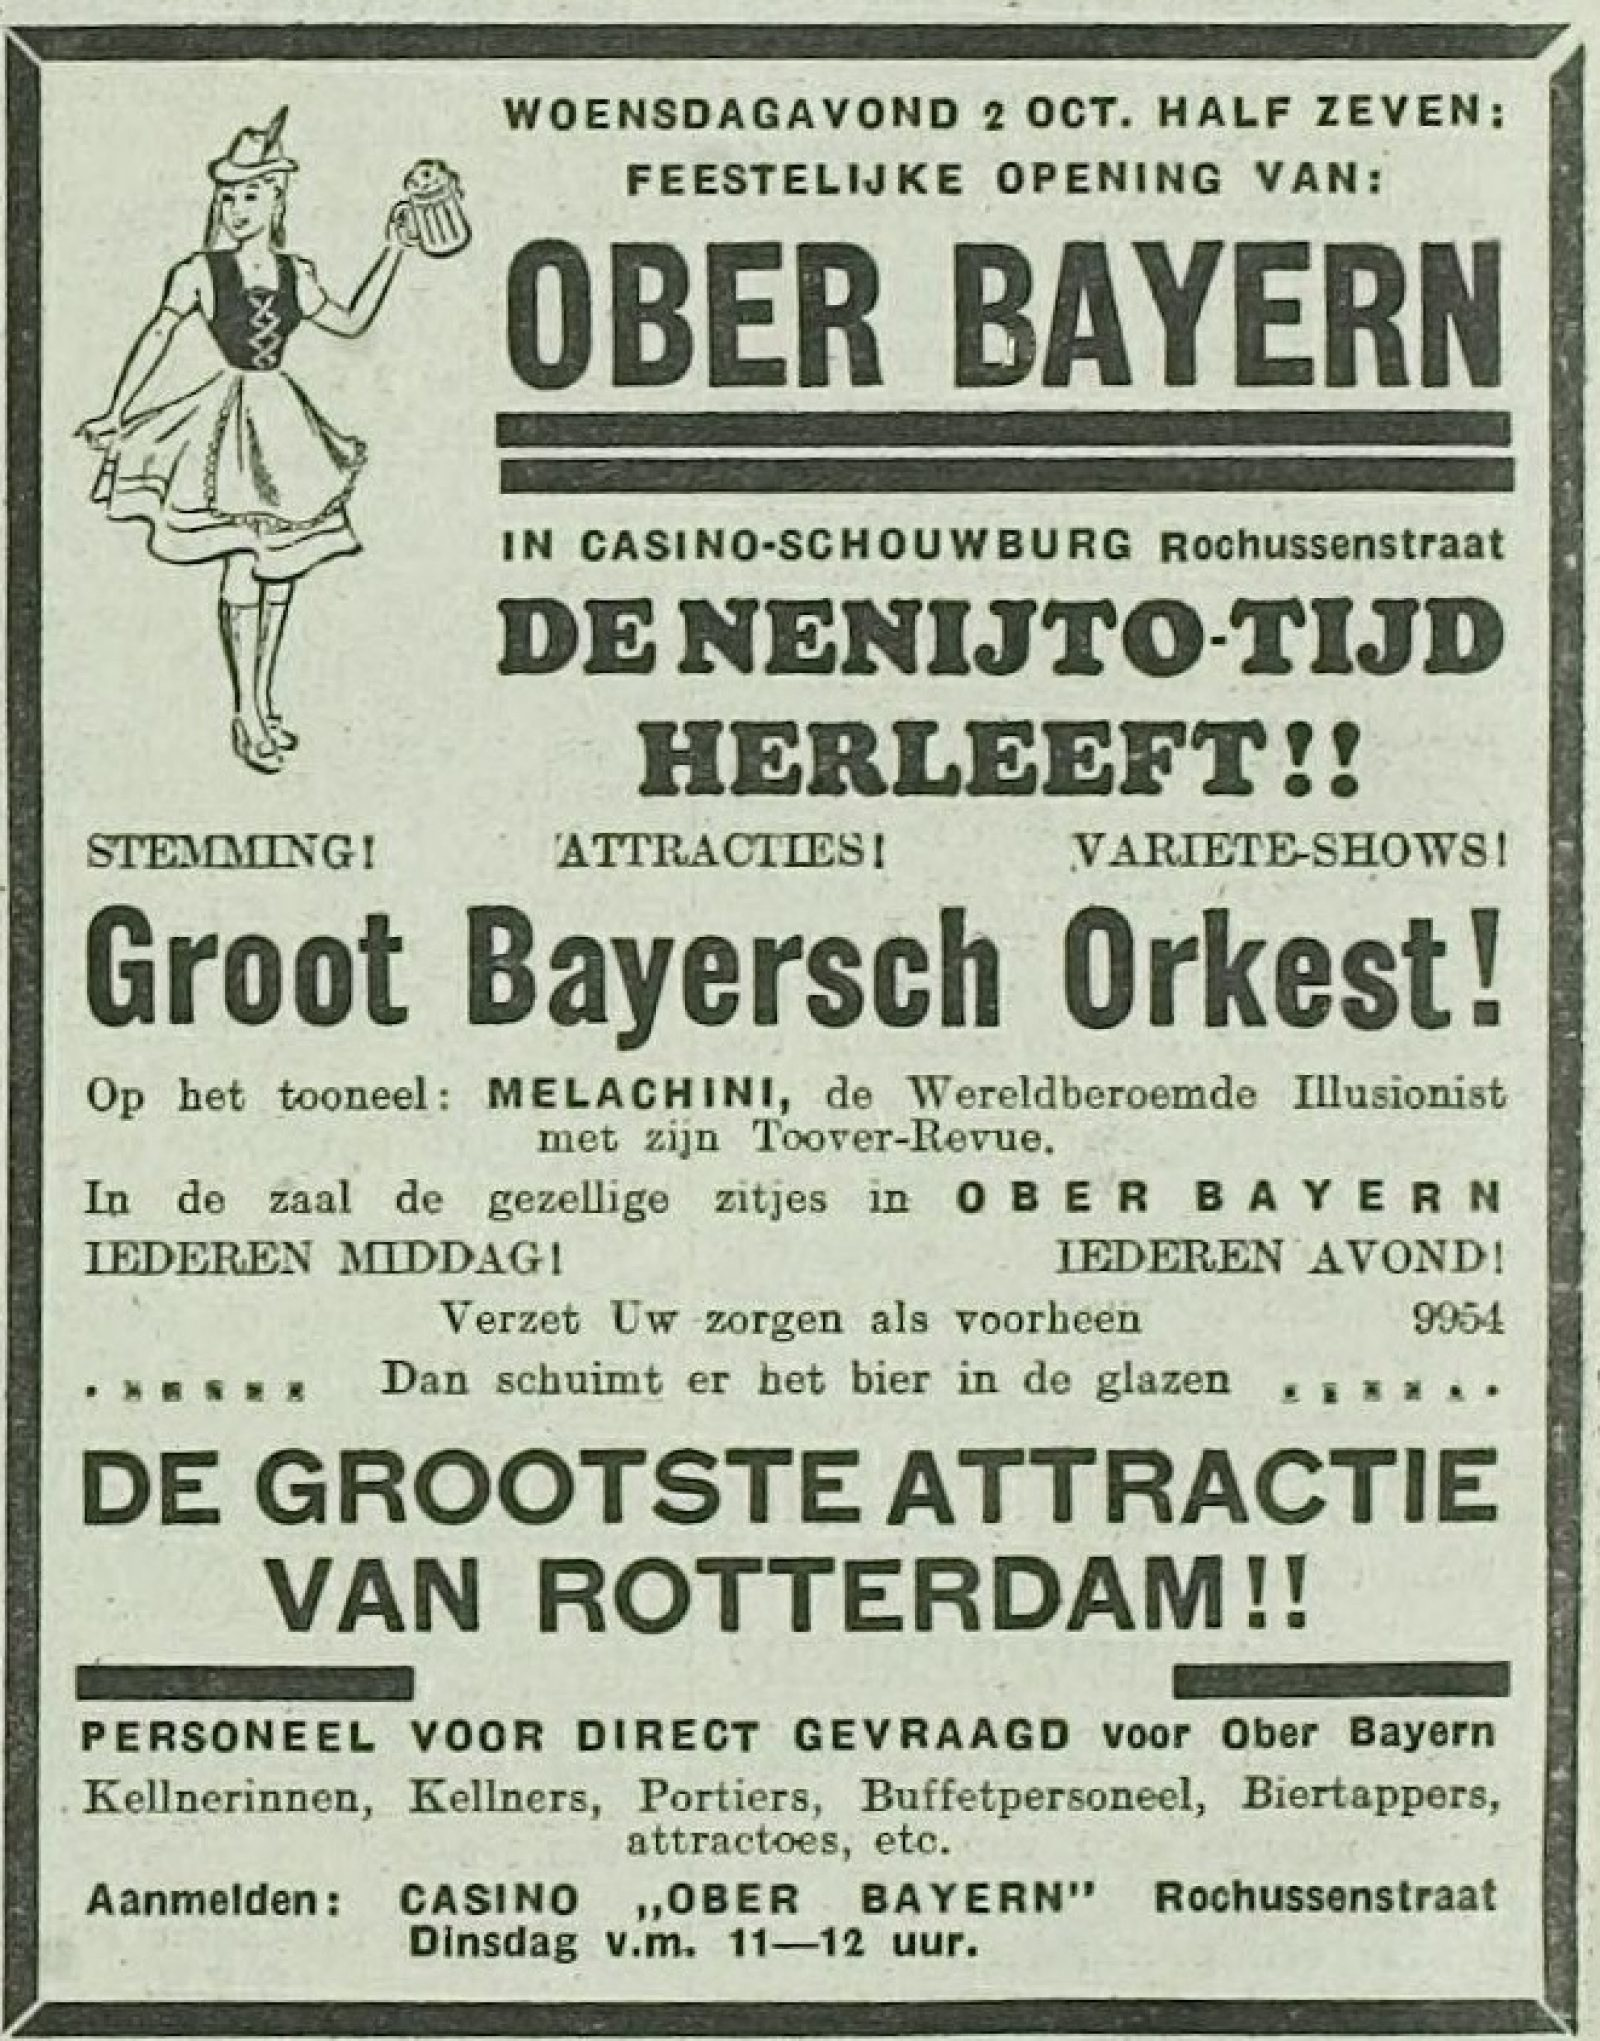 Noodw Ober Bayern Casino RN 30 09 1940